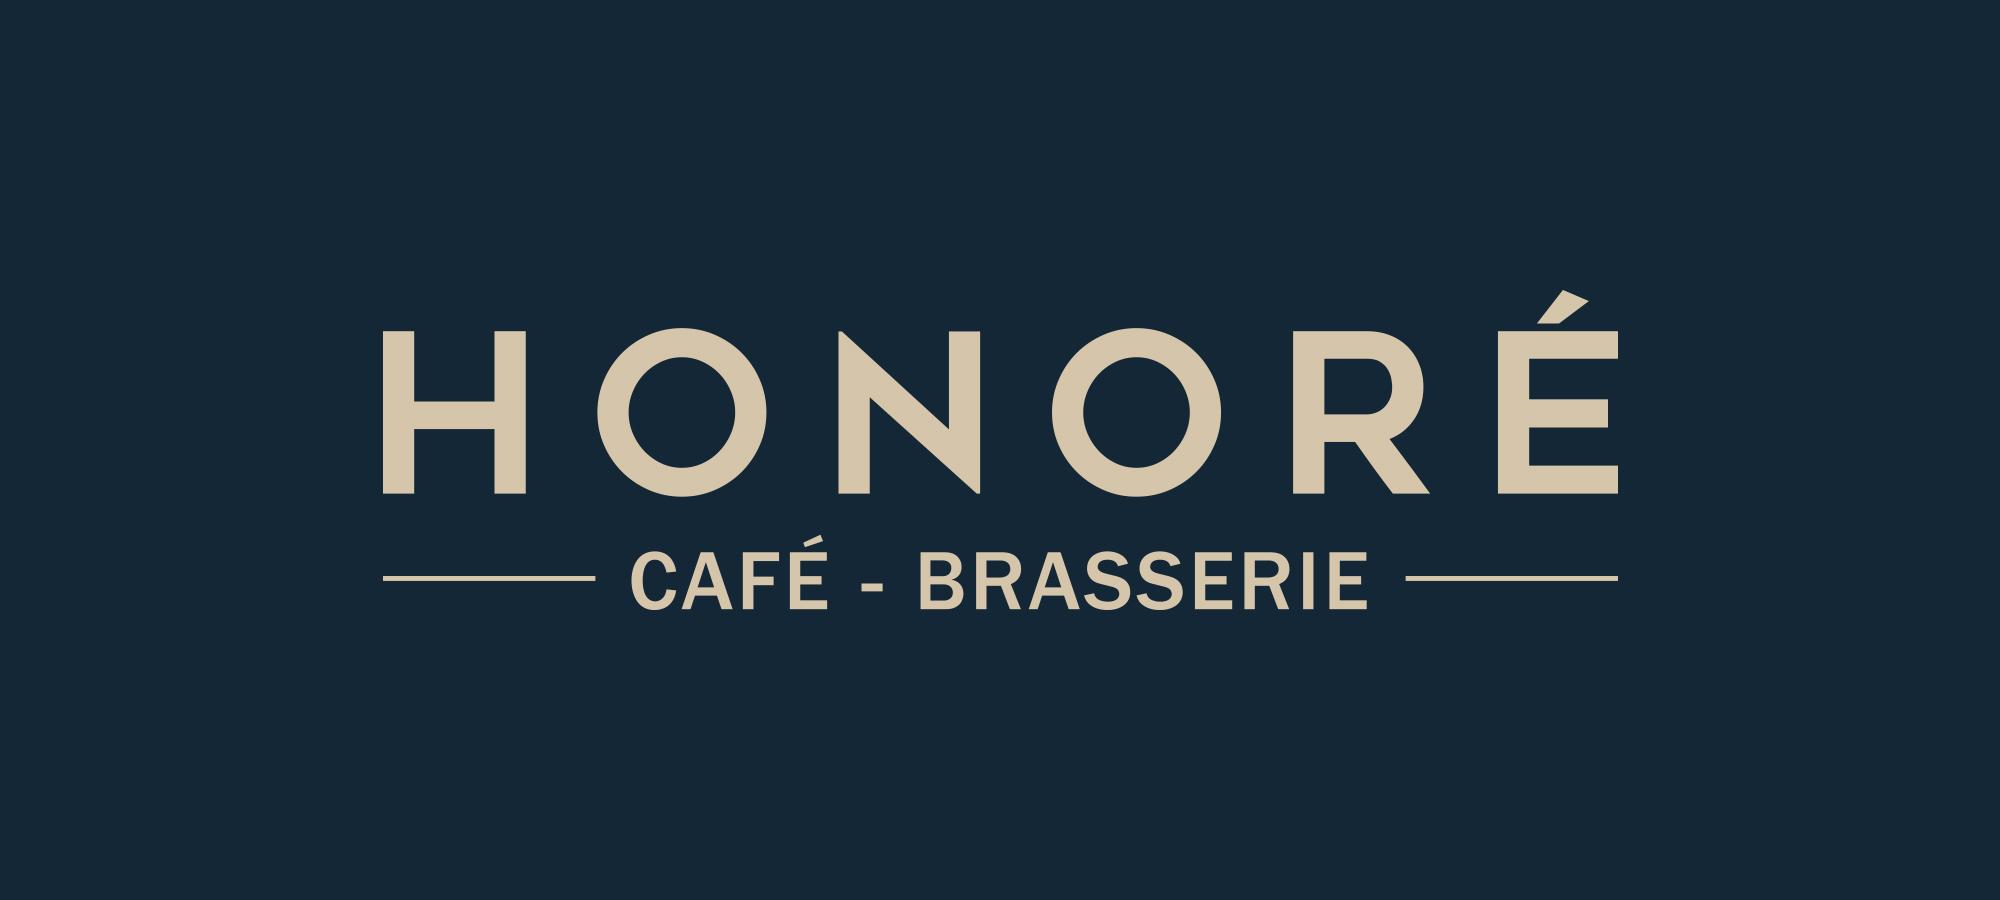 HONORE©Agence-TroisPetitsPoints-Communication